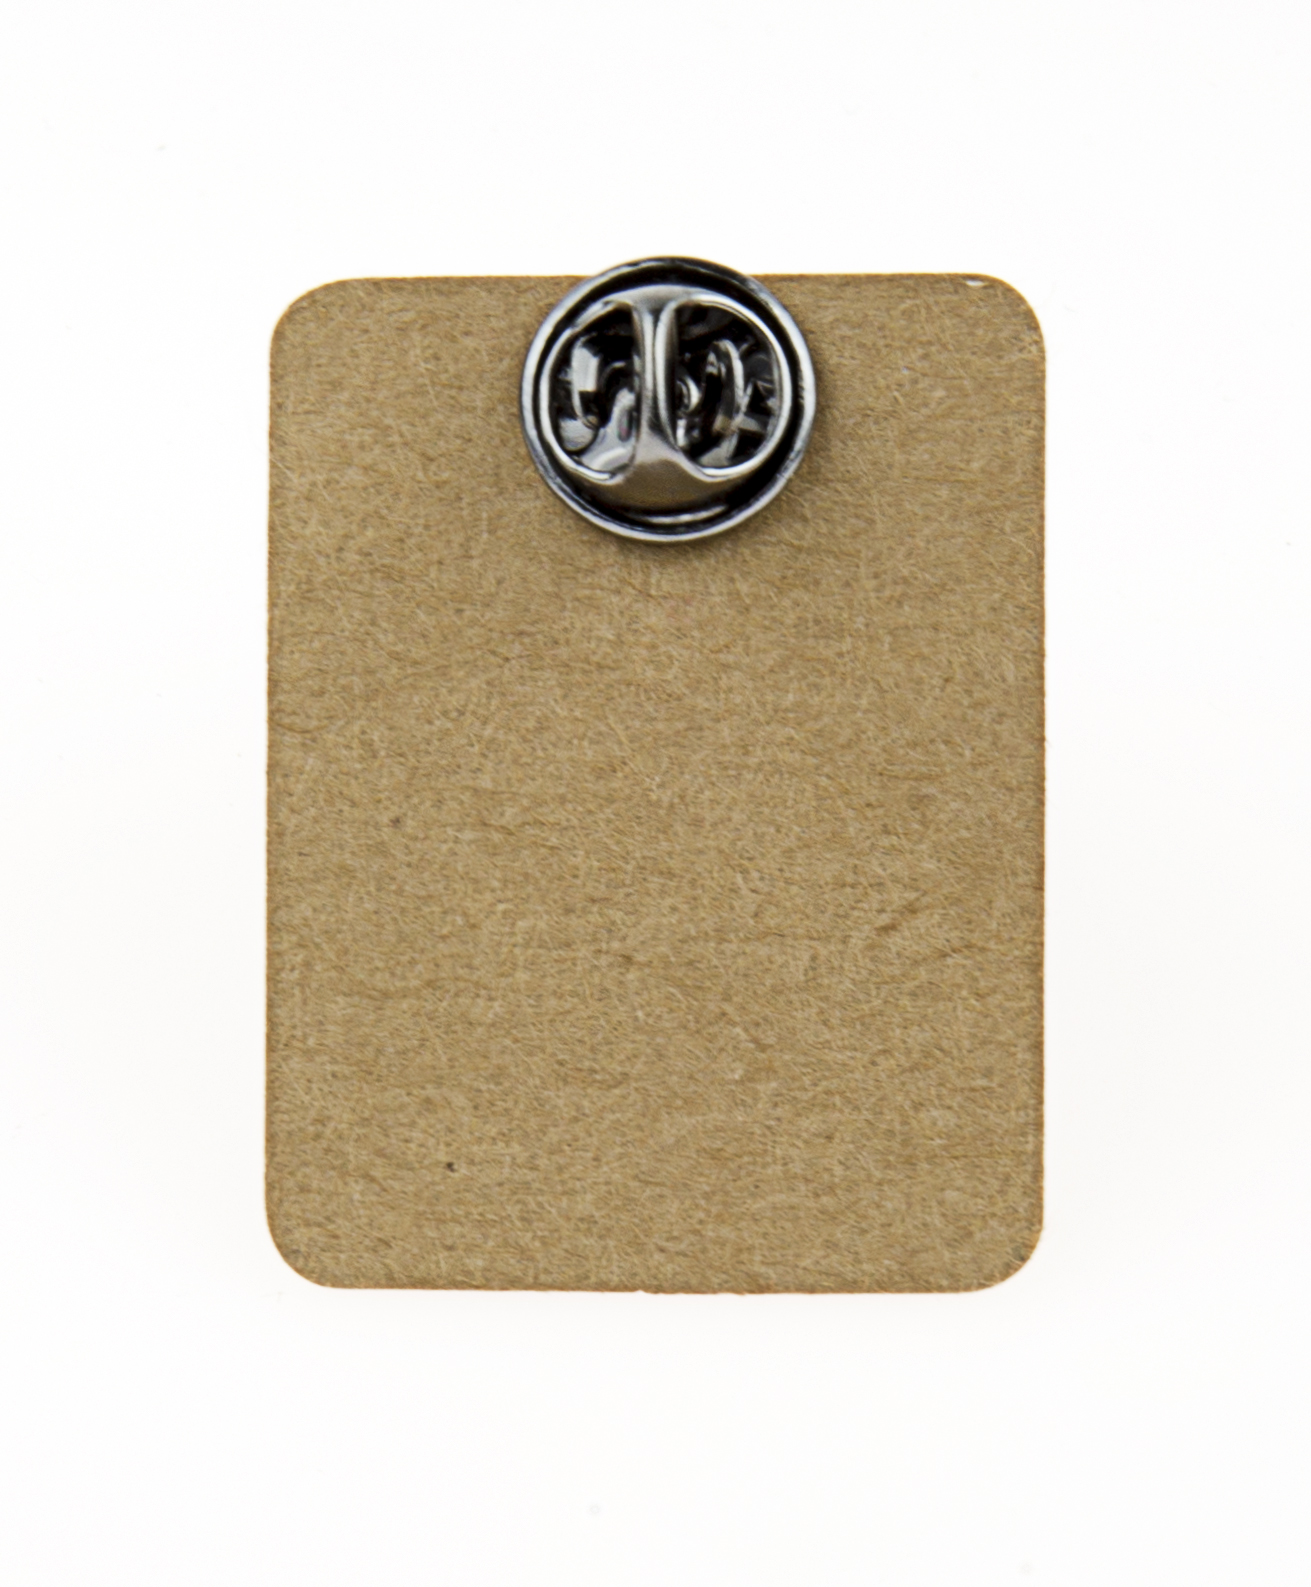 Metal Hamburger Enamel Pin Badge